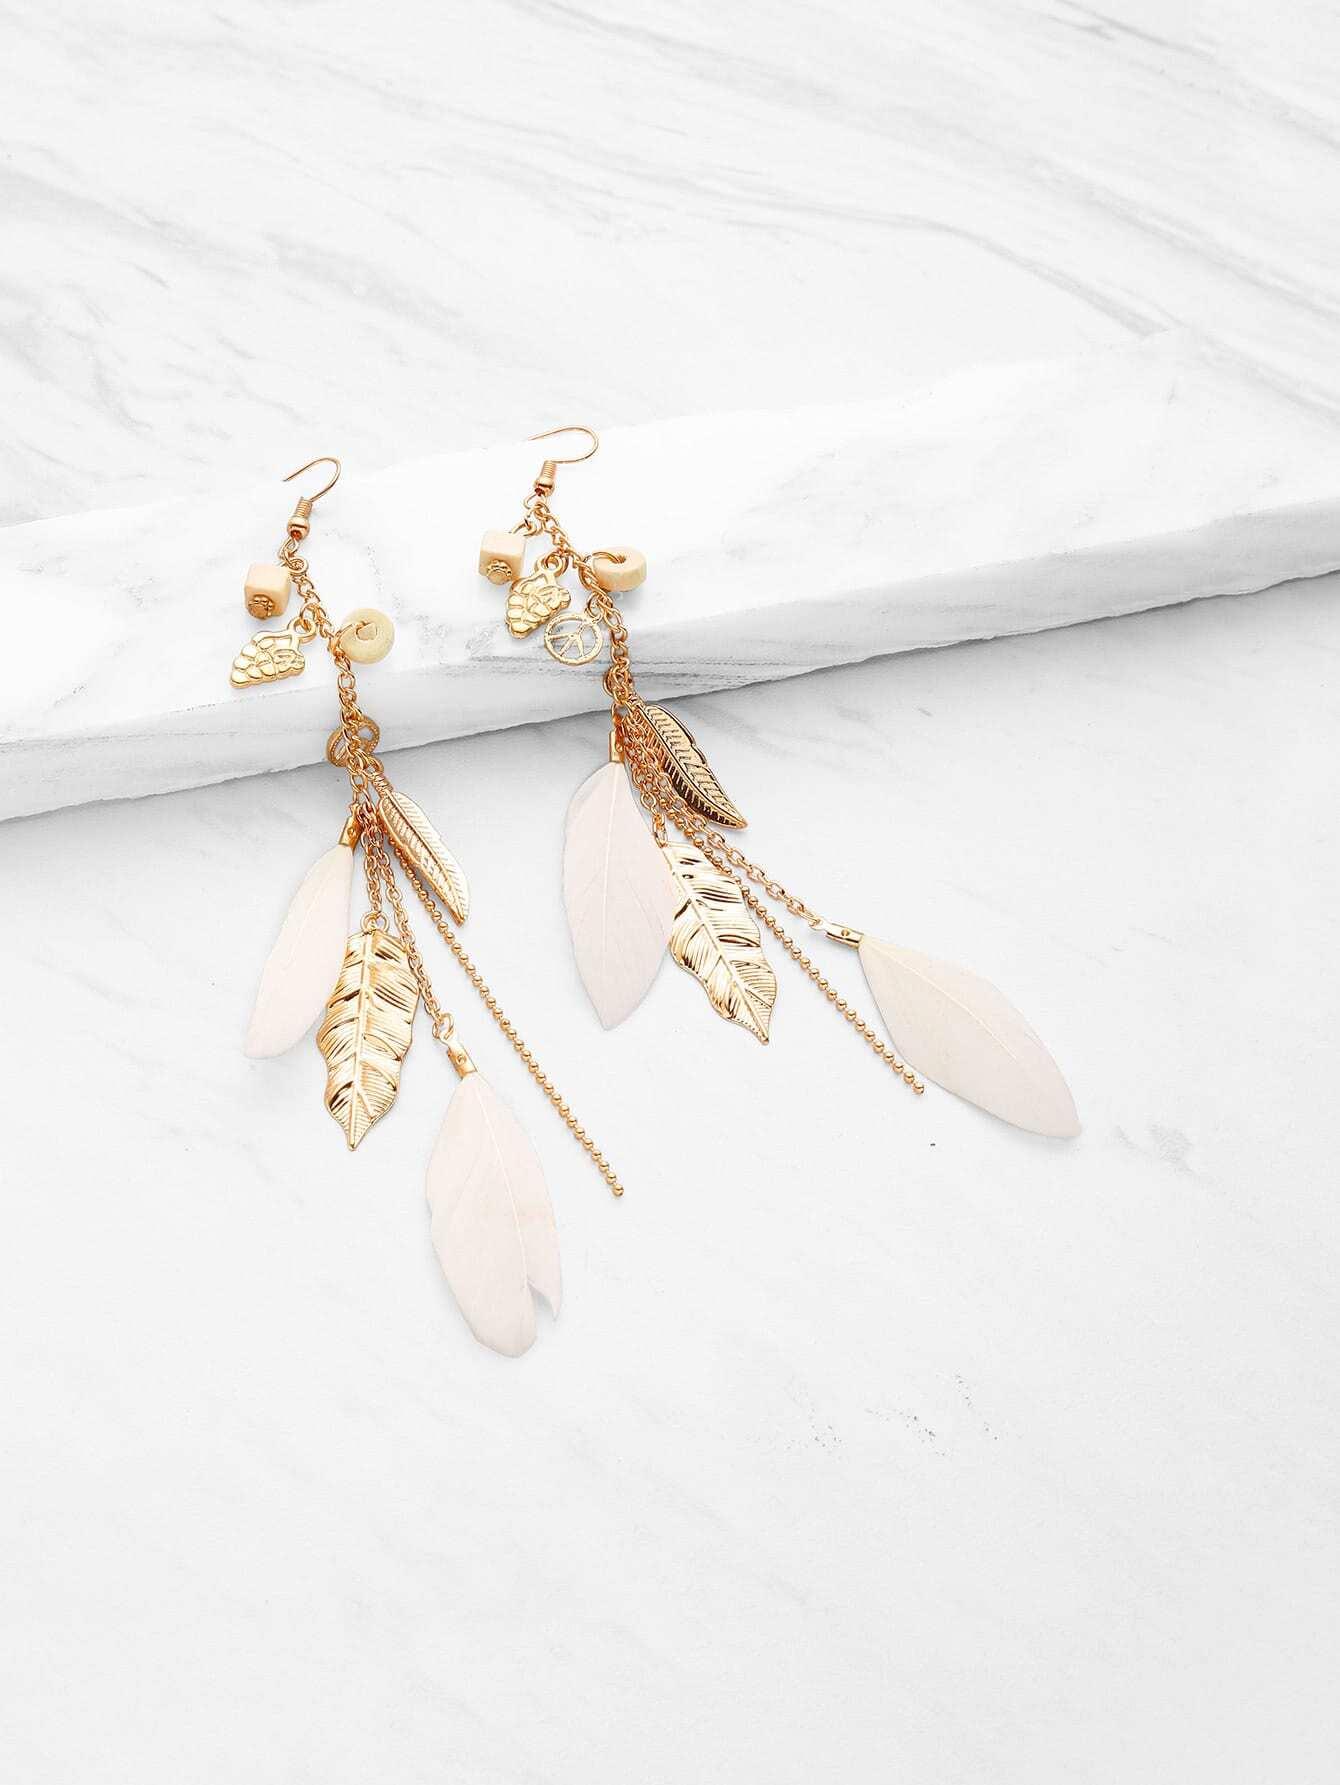 Feather & Leaf Embellished Drop Earrings bohemia leaf feather rhinestone embellished drop earrings